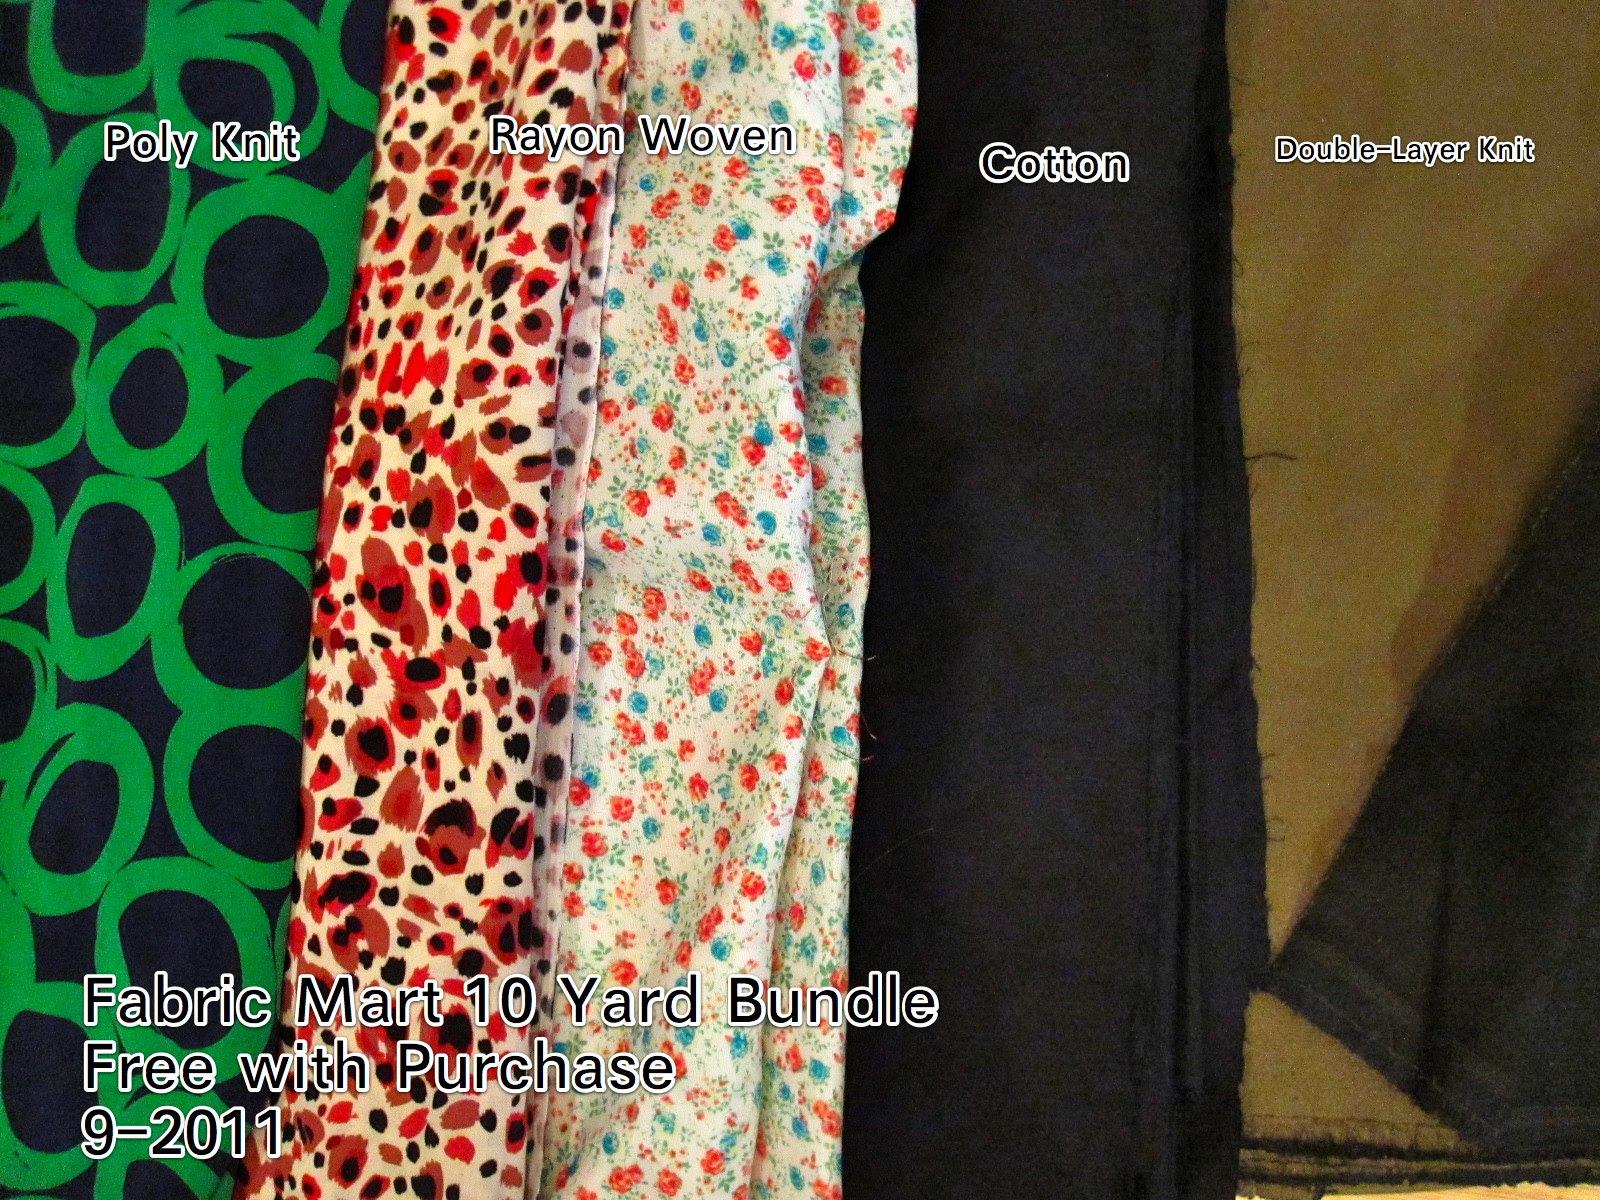 Fabric Mart Free Bundle 9-2011